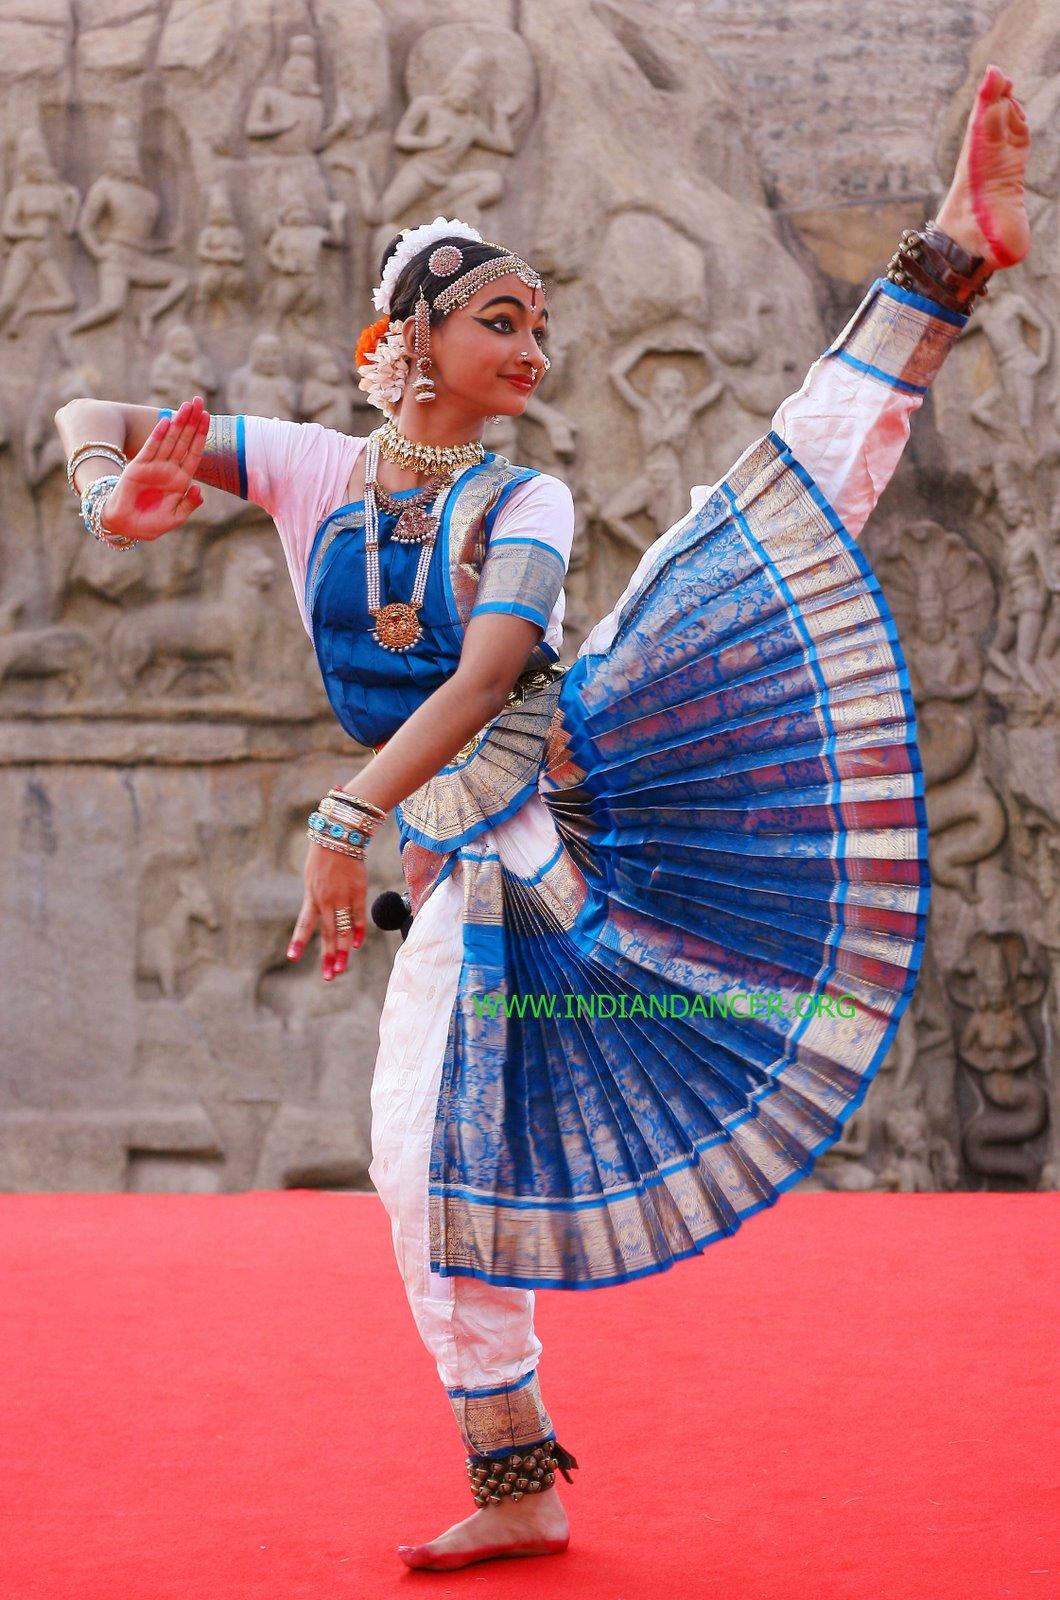 bharatanatyam poses - photo #39